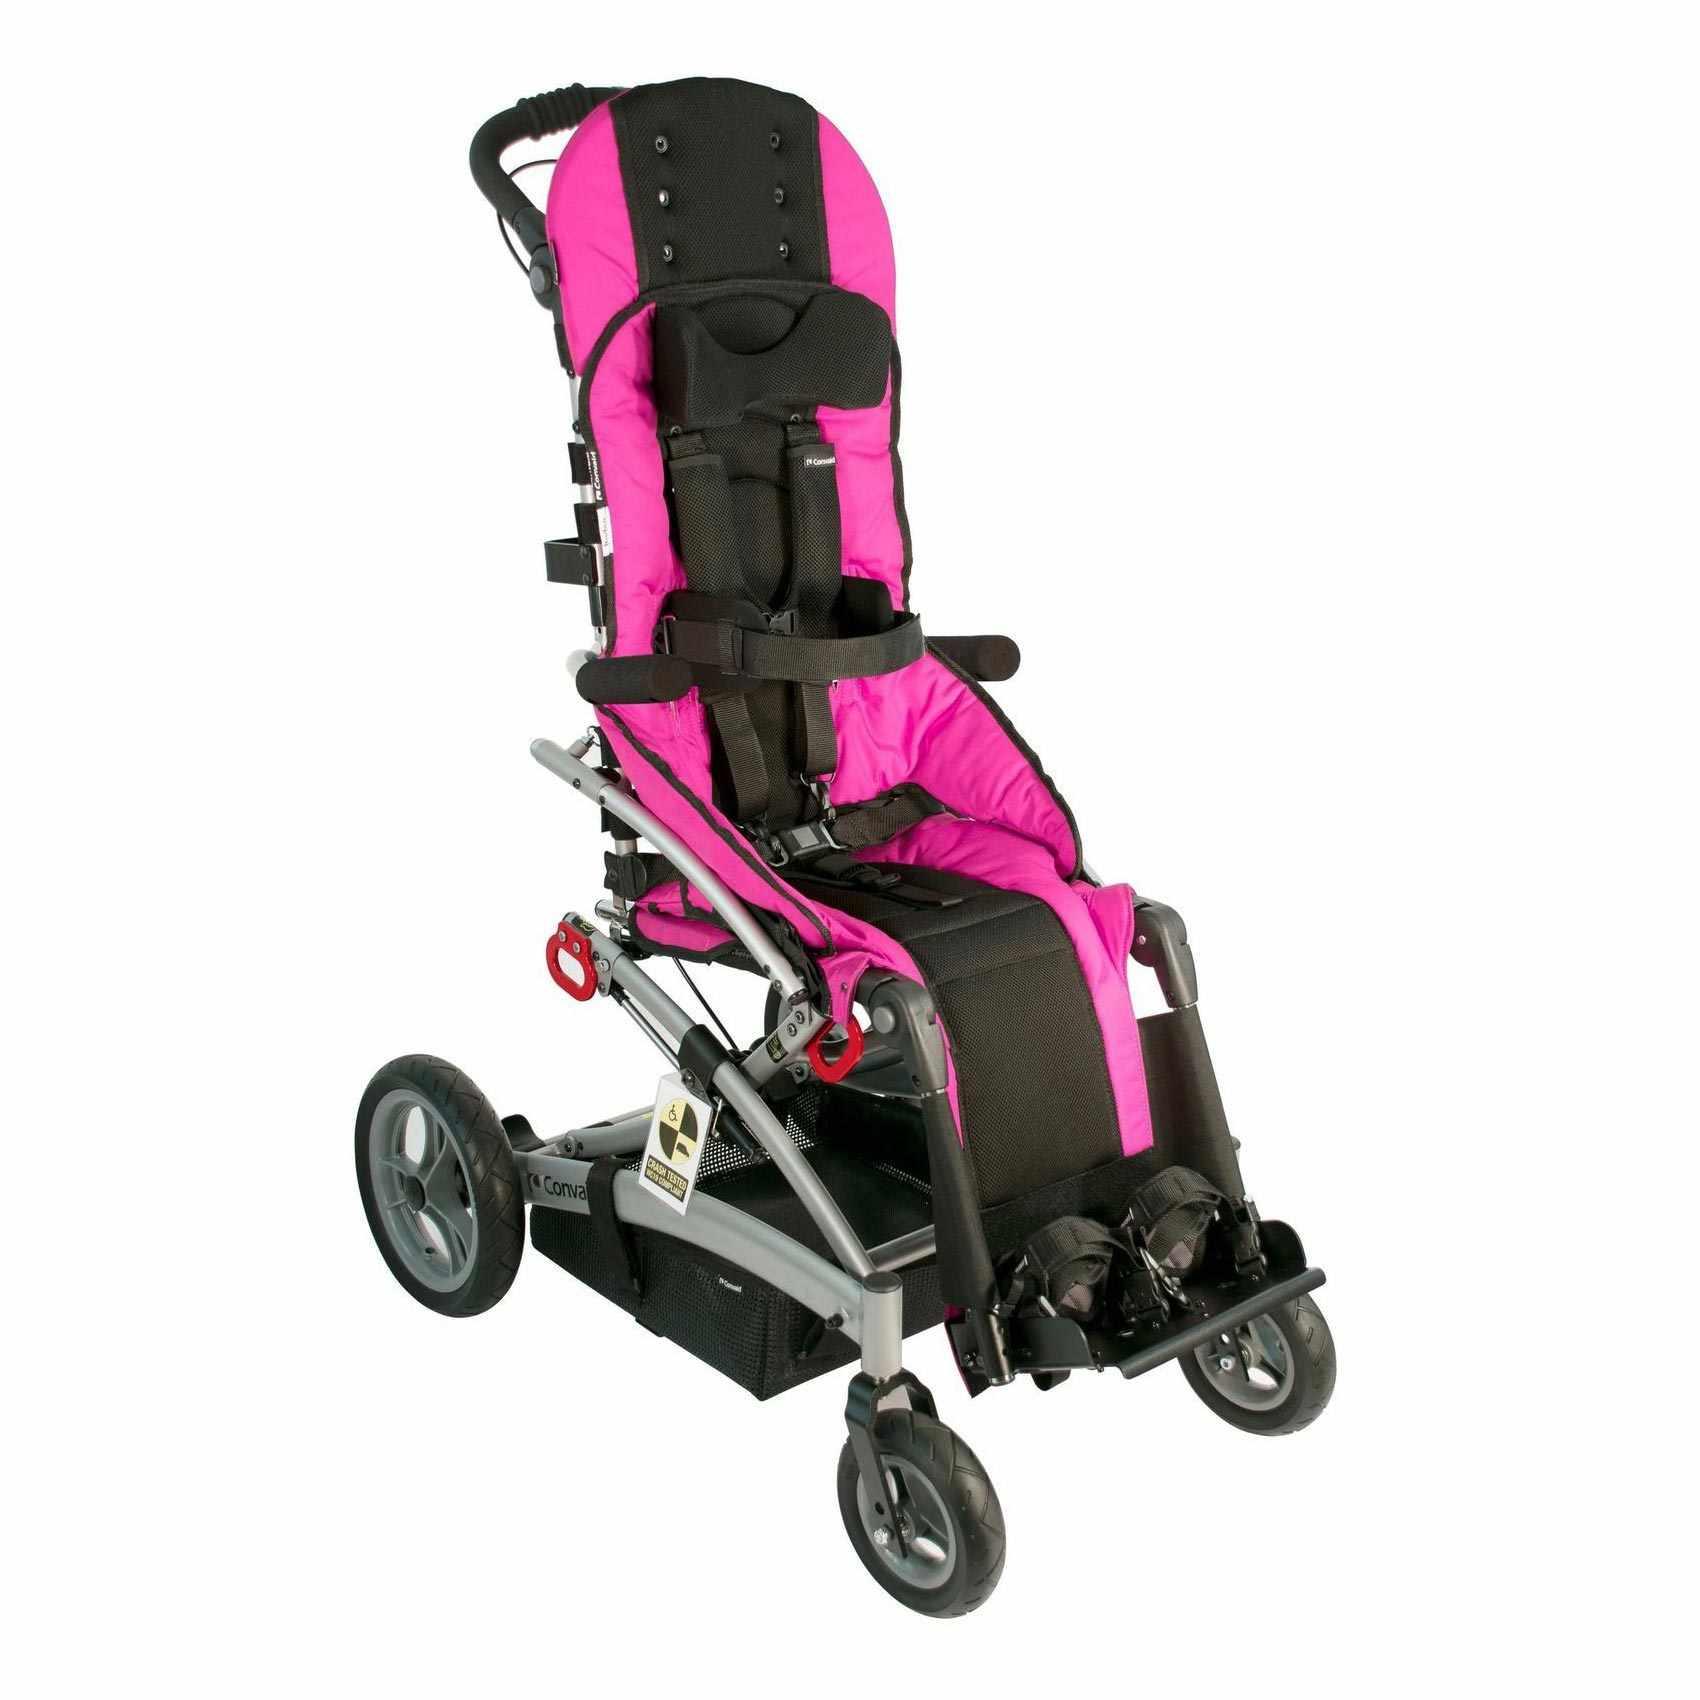 Convaid rodeo tilt-in space wheelchair